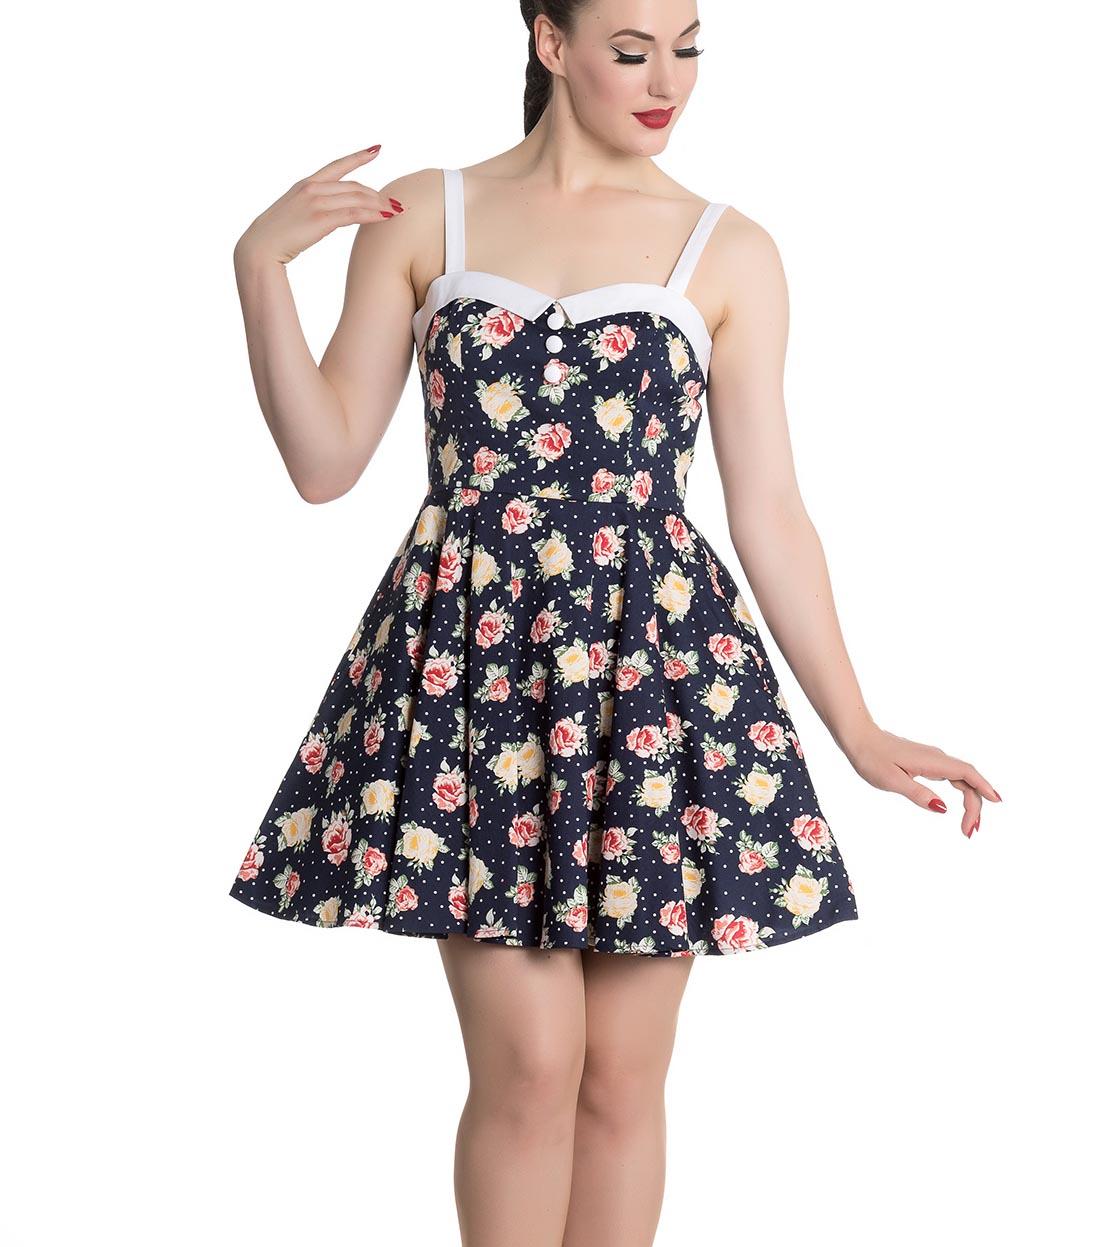 Hell-Bunny-Navy-Blue-Floral-Roses-Flowers-Mini-Dress-EMMA-Polka-Dot-All-Sizes thumbnail 15